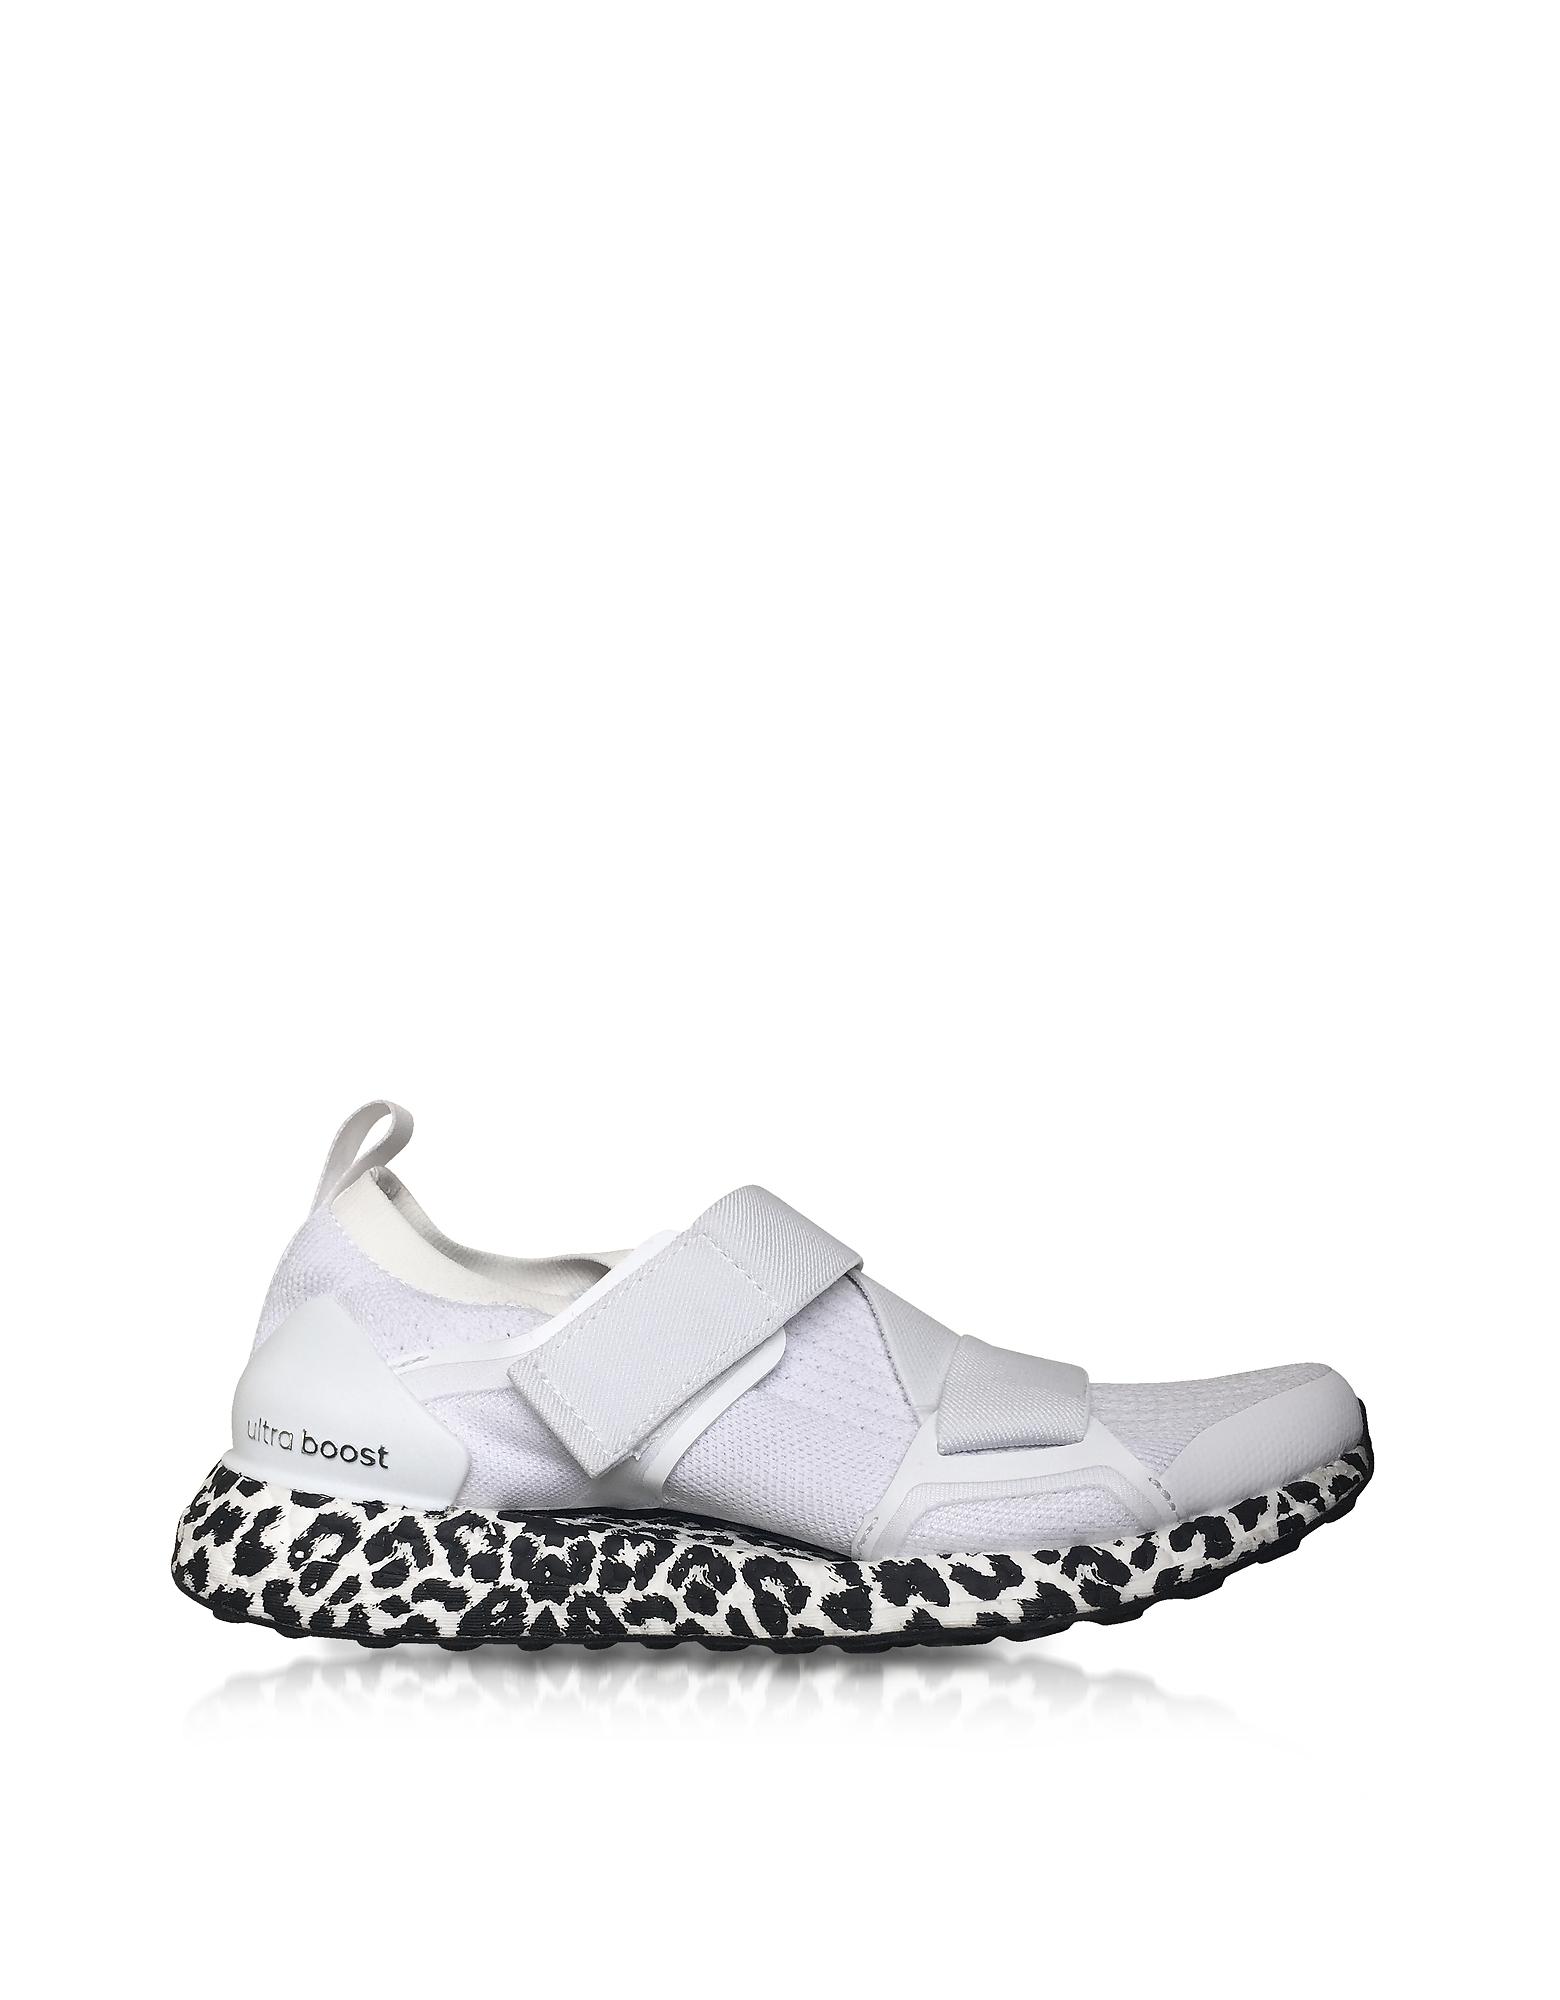 Adidas Stella McCartney Shoes, UltraBOOST X White Women's Sneakers